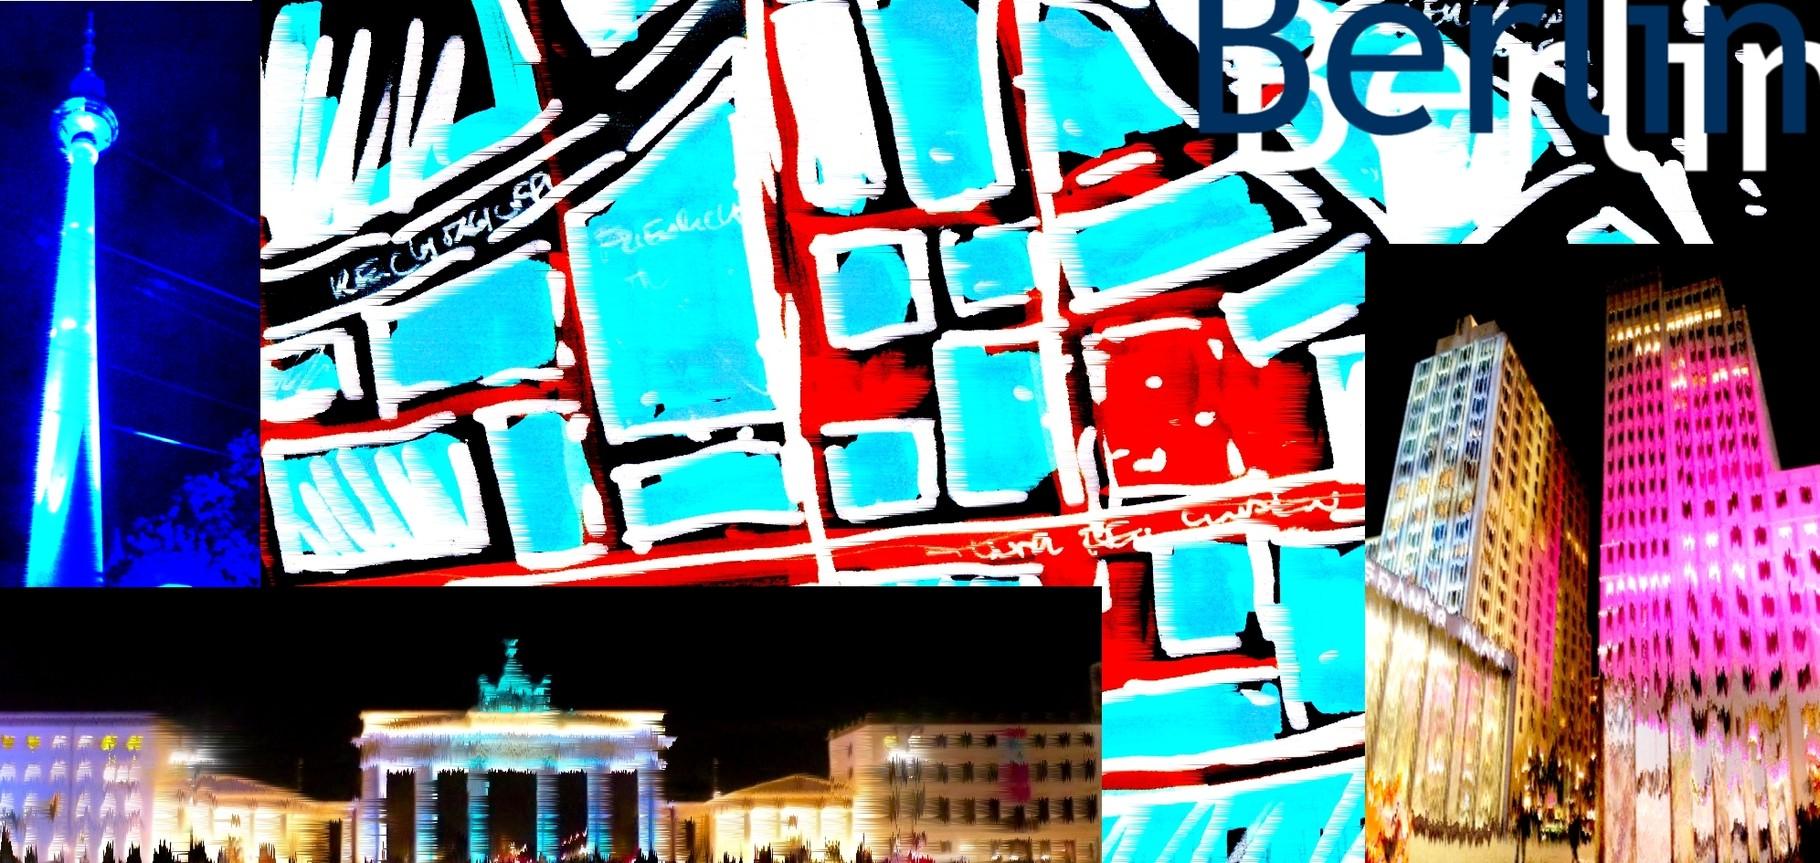 Berlin 2, 2013